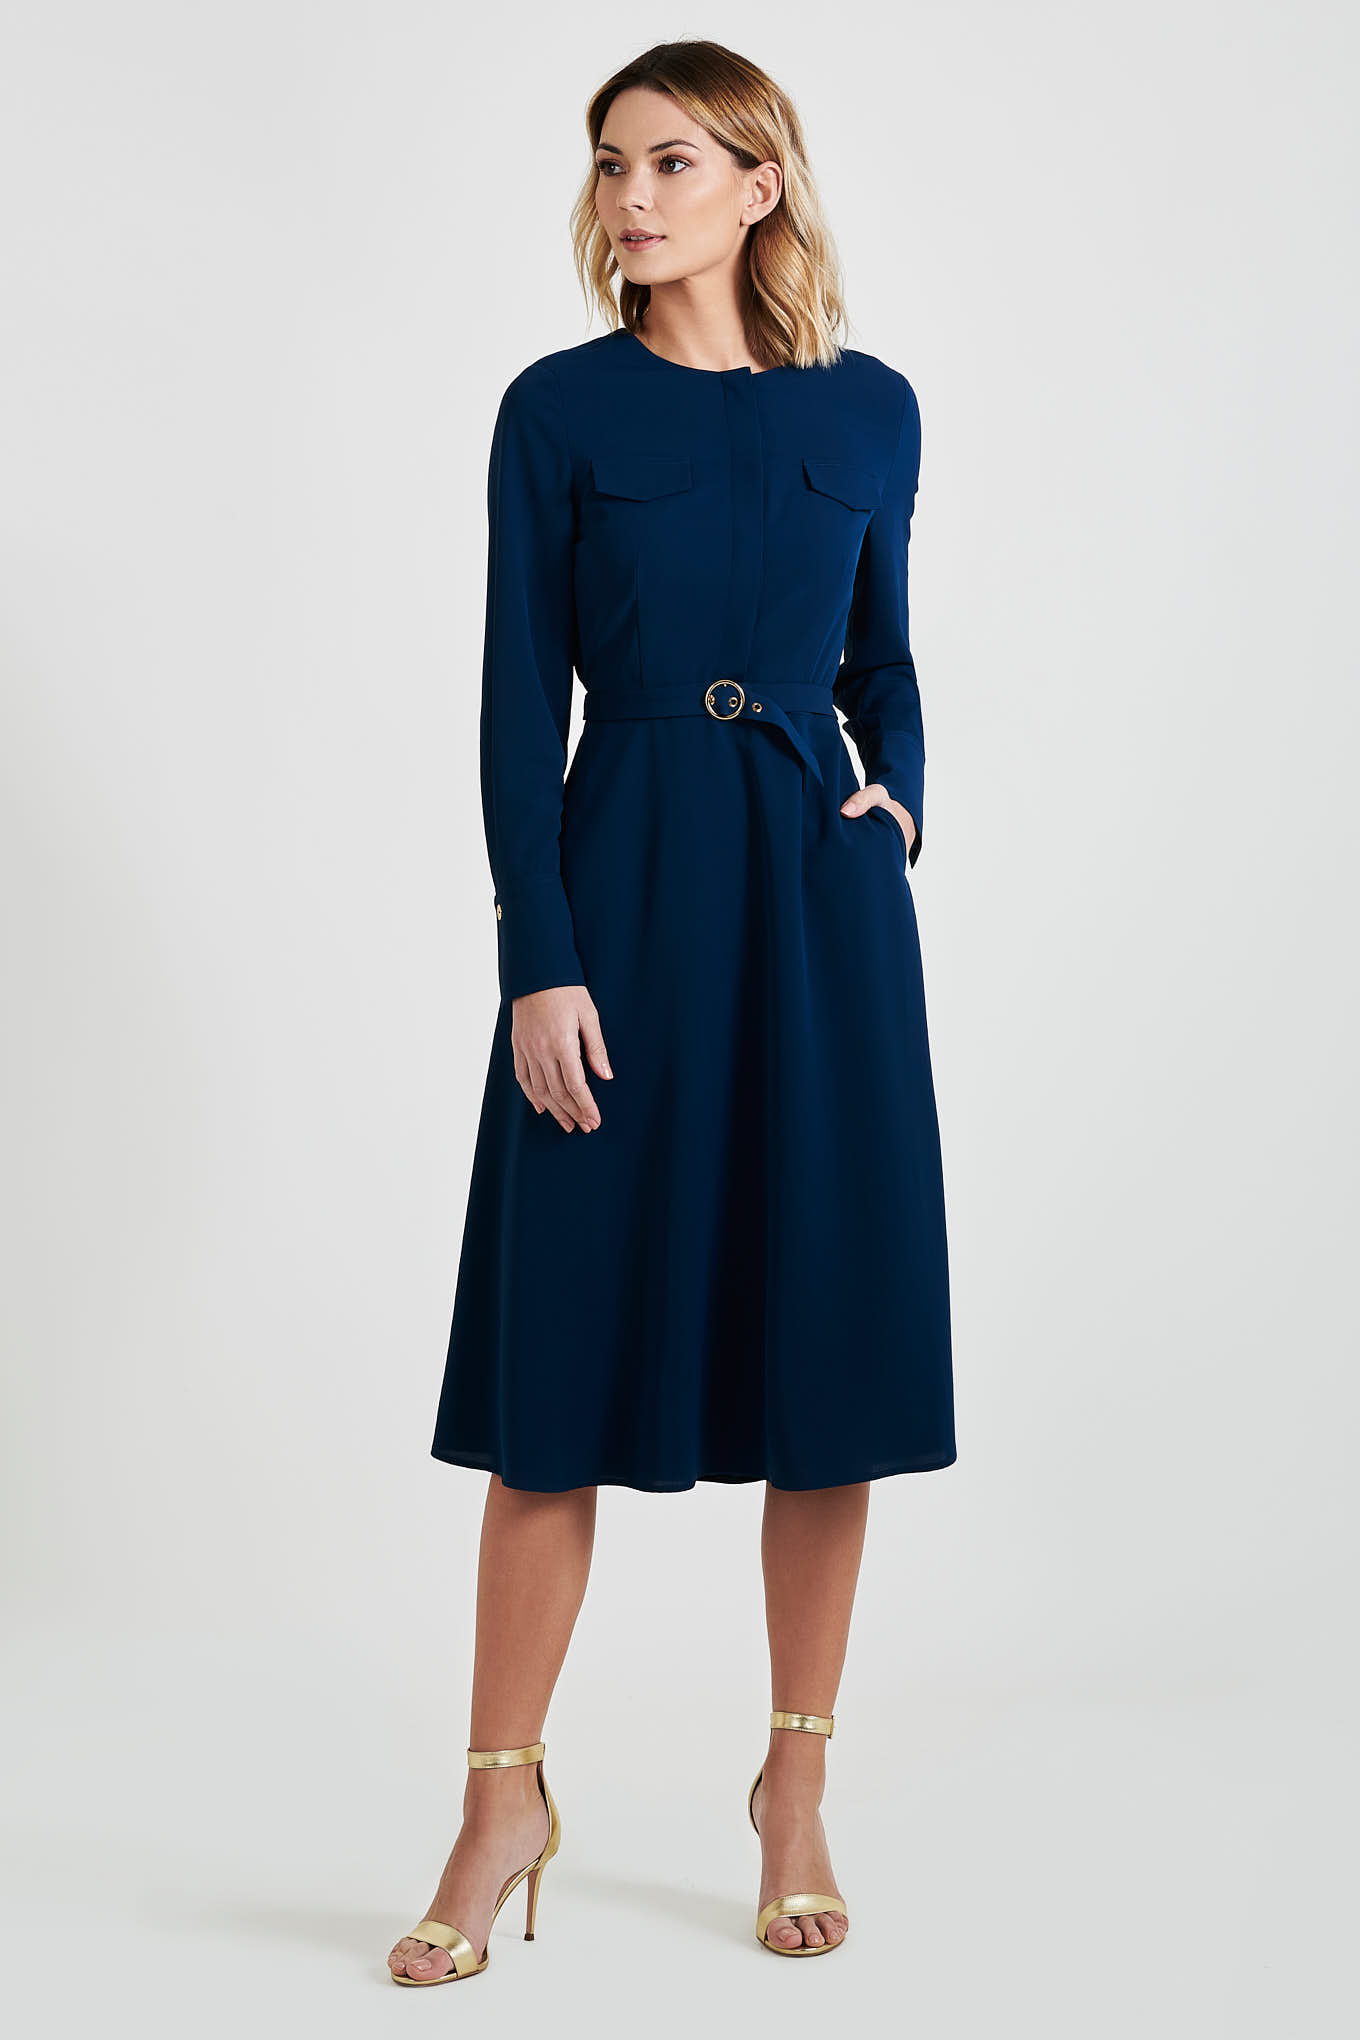 Dress Dark Blue Fantasy Woman